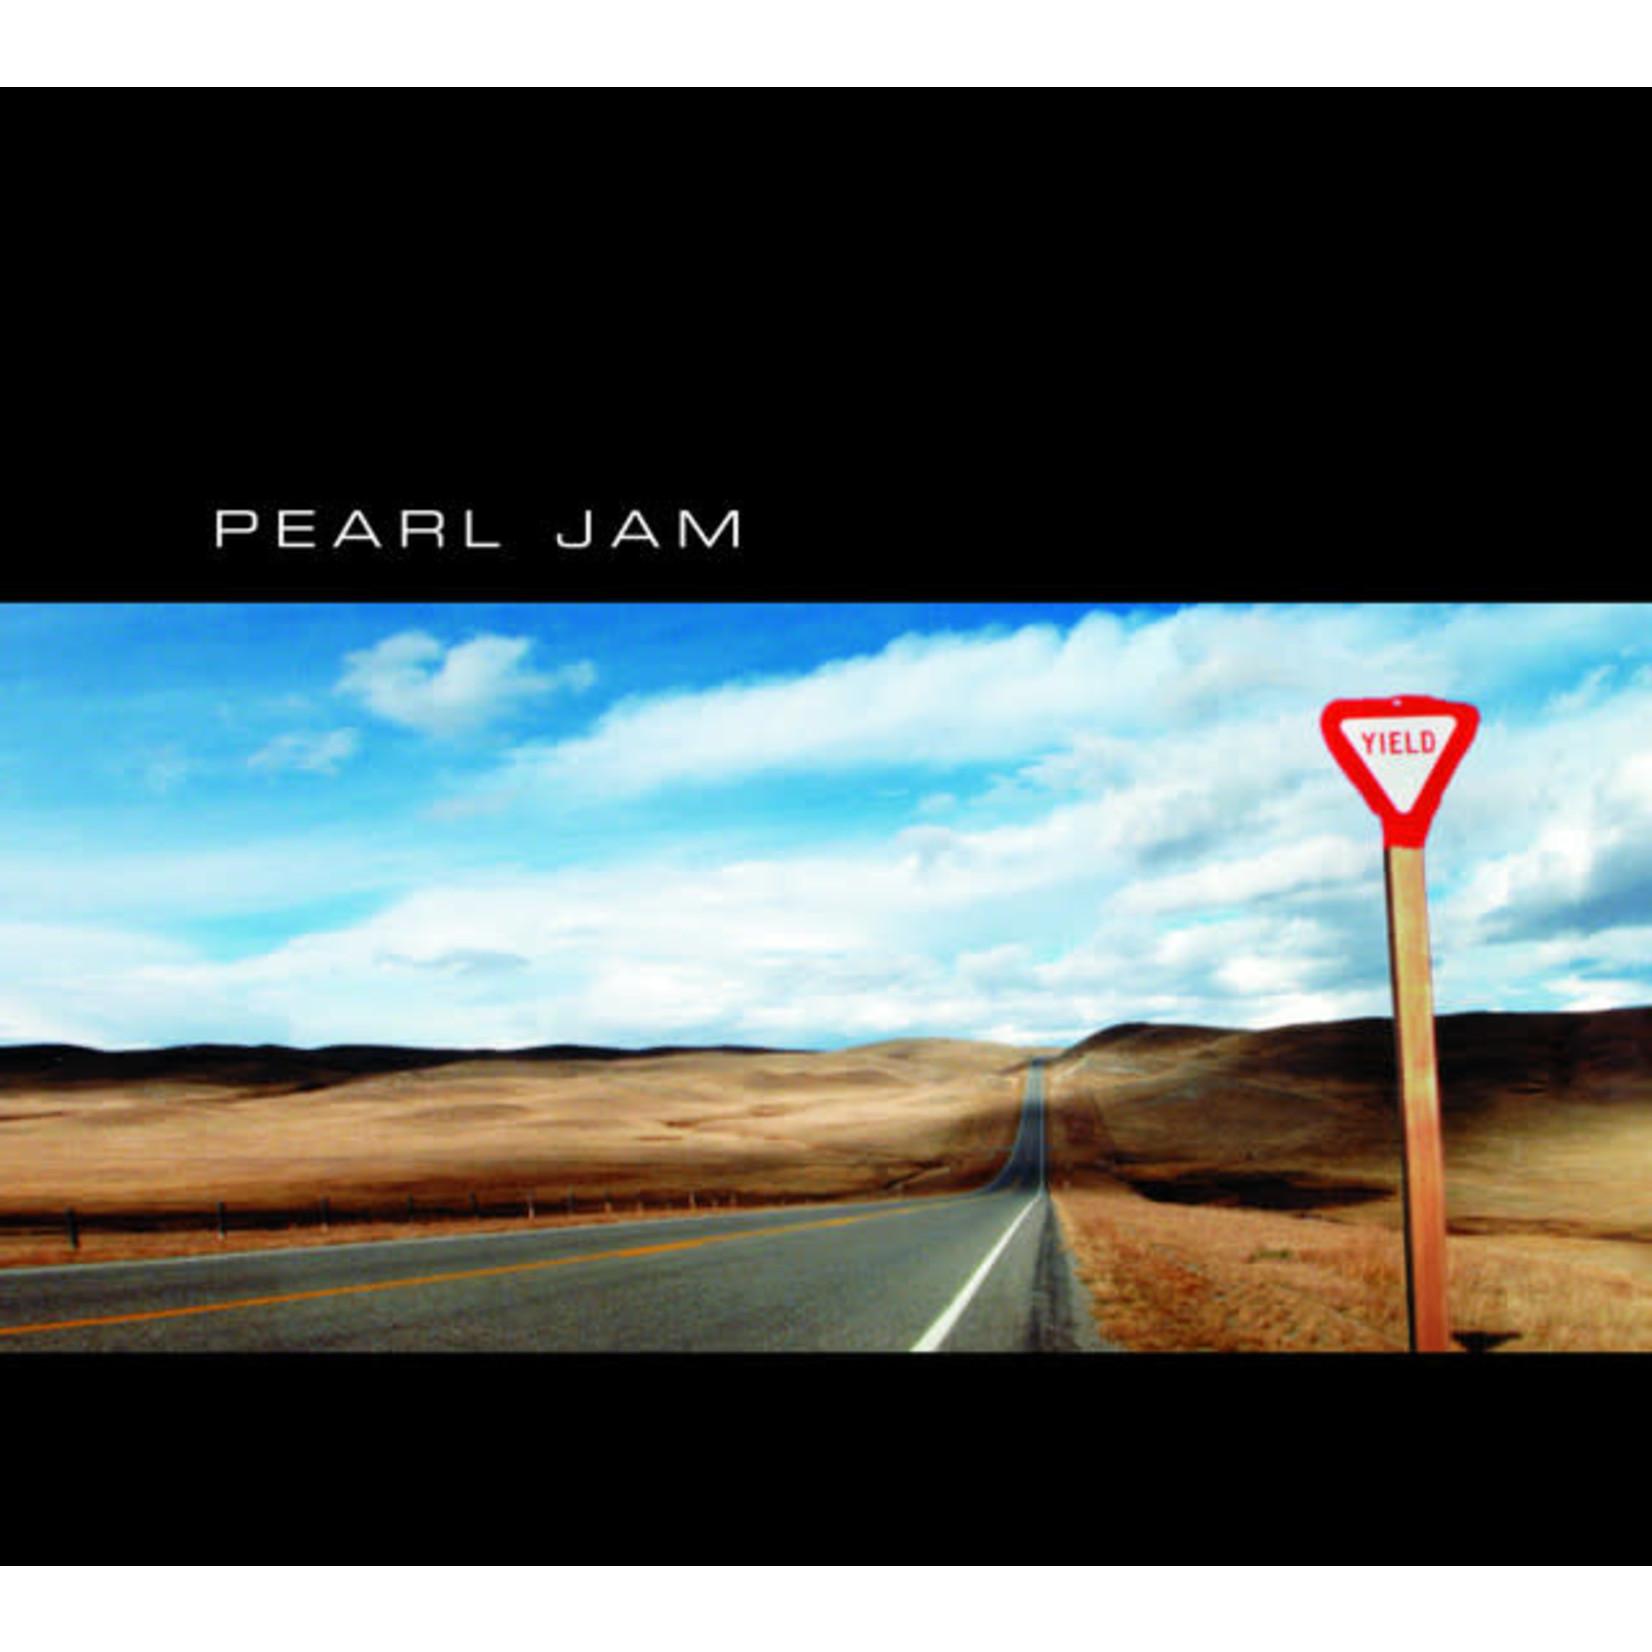 Vinyl Pearl Jam - Yield